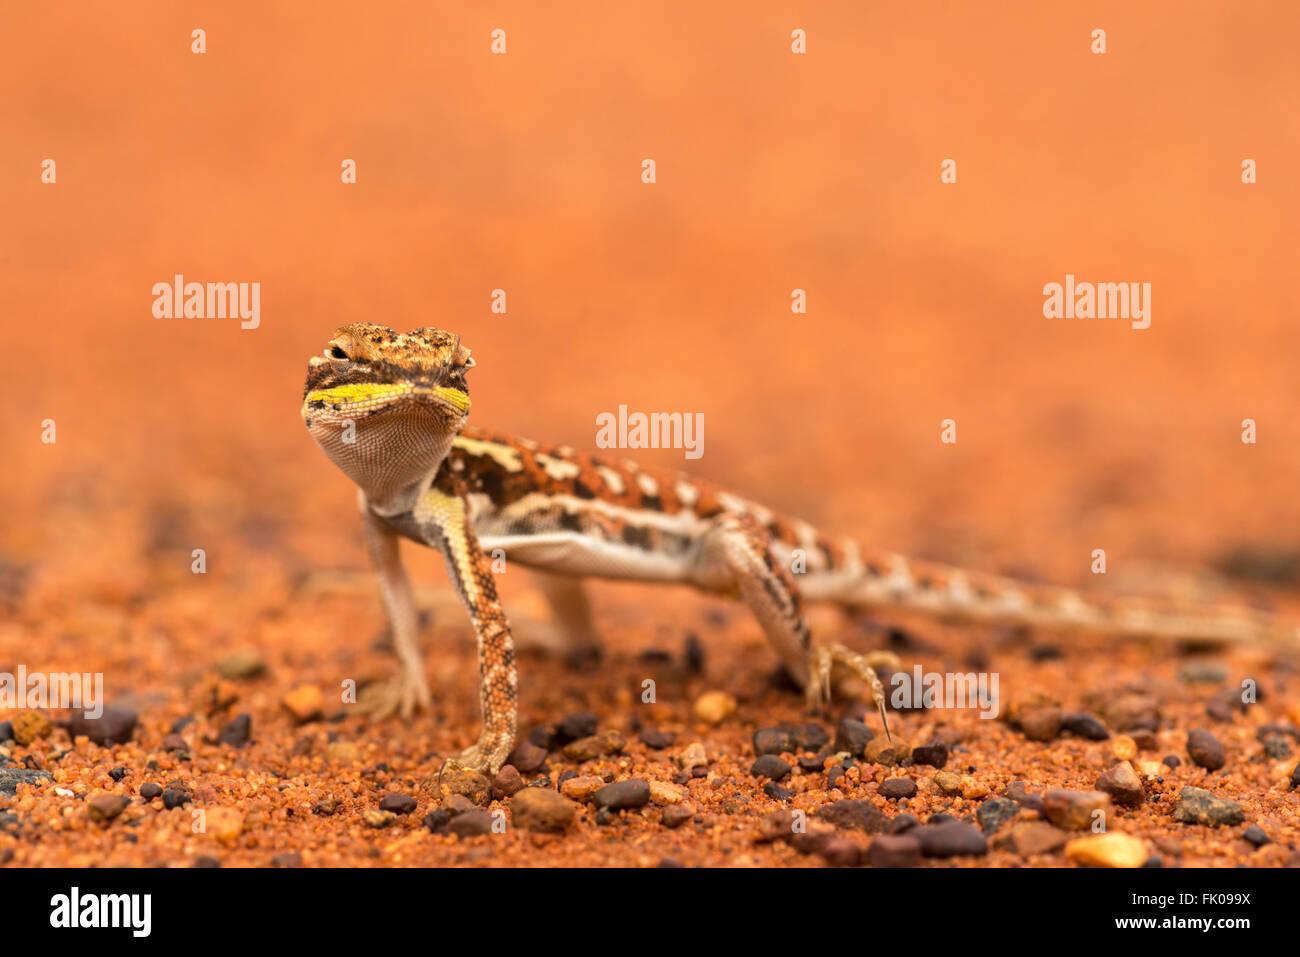 Military Dragon (Ctenophorus isolepis gularis) in Outback Uluru - Stock Image